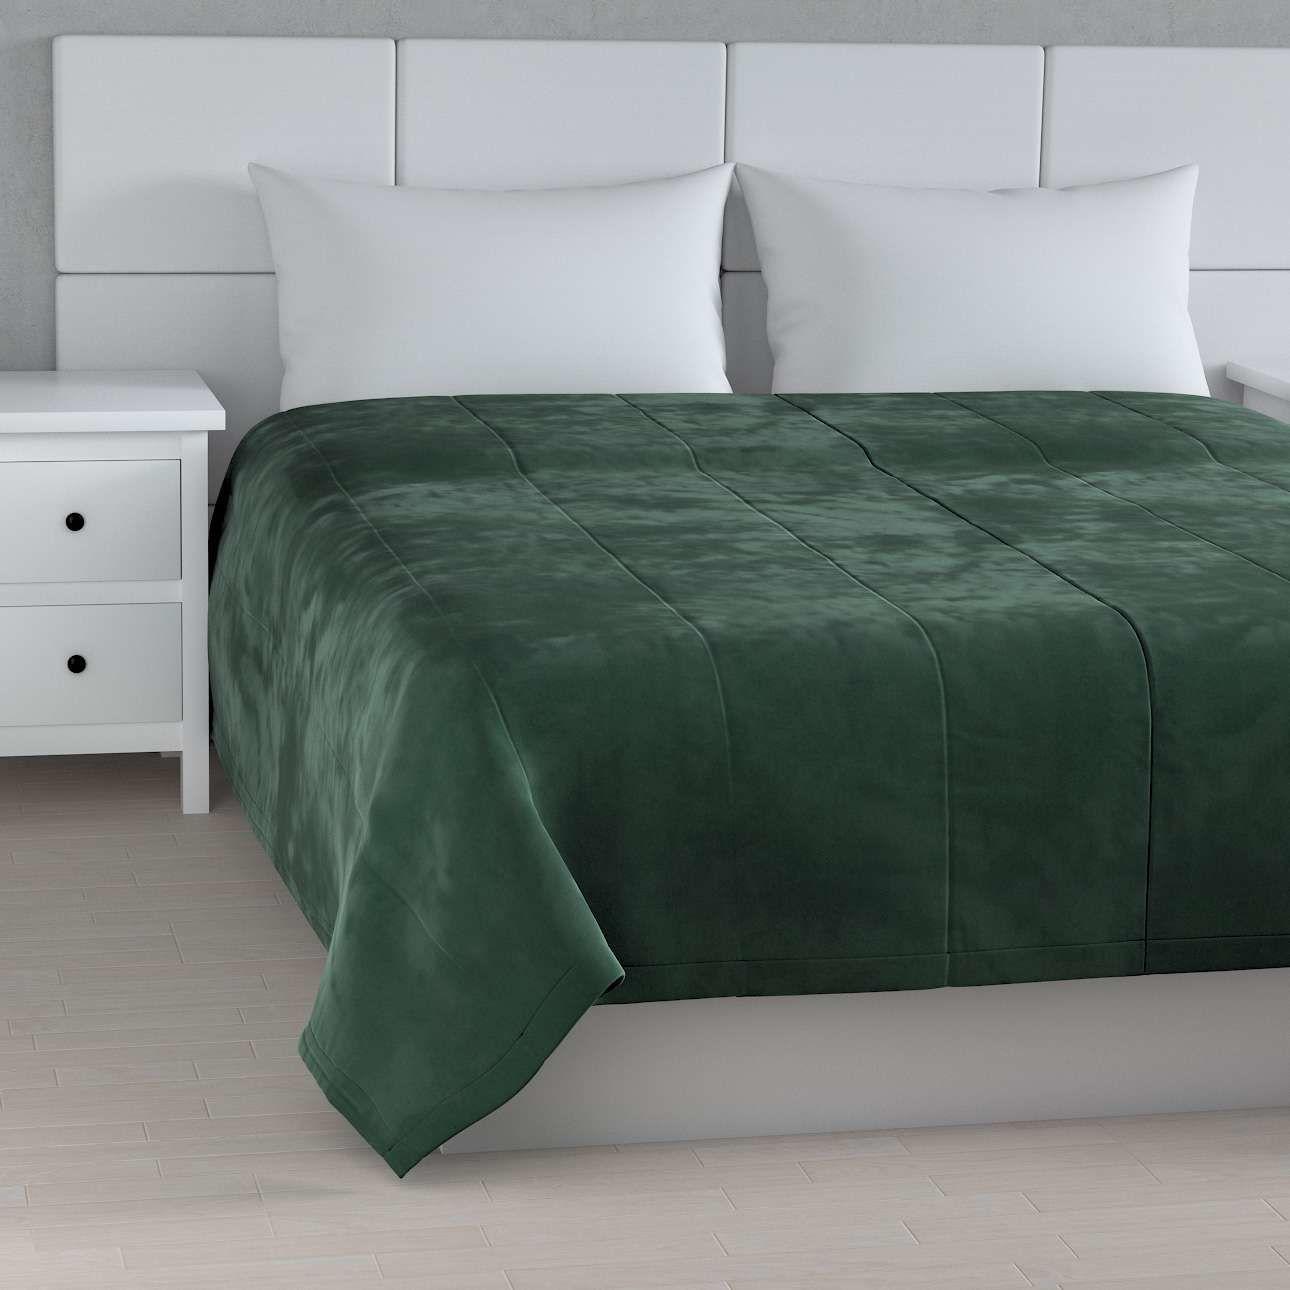 Narzuta pikowana w pasy Velvet 260 x 240 cm, ciemny zielony, szer.260  dł.240 cm, Velvet